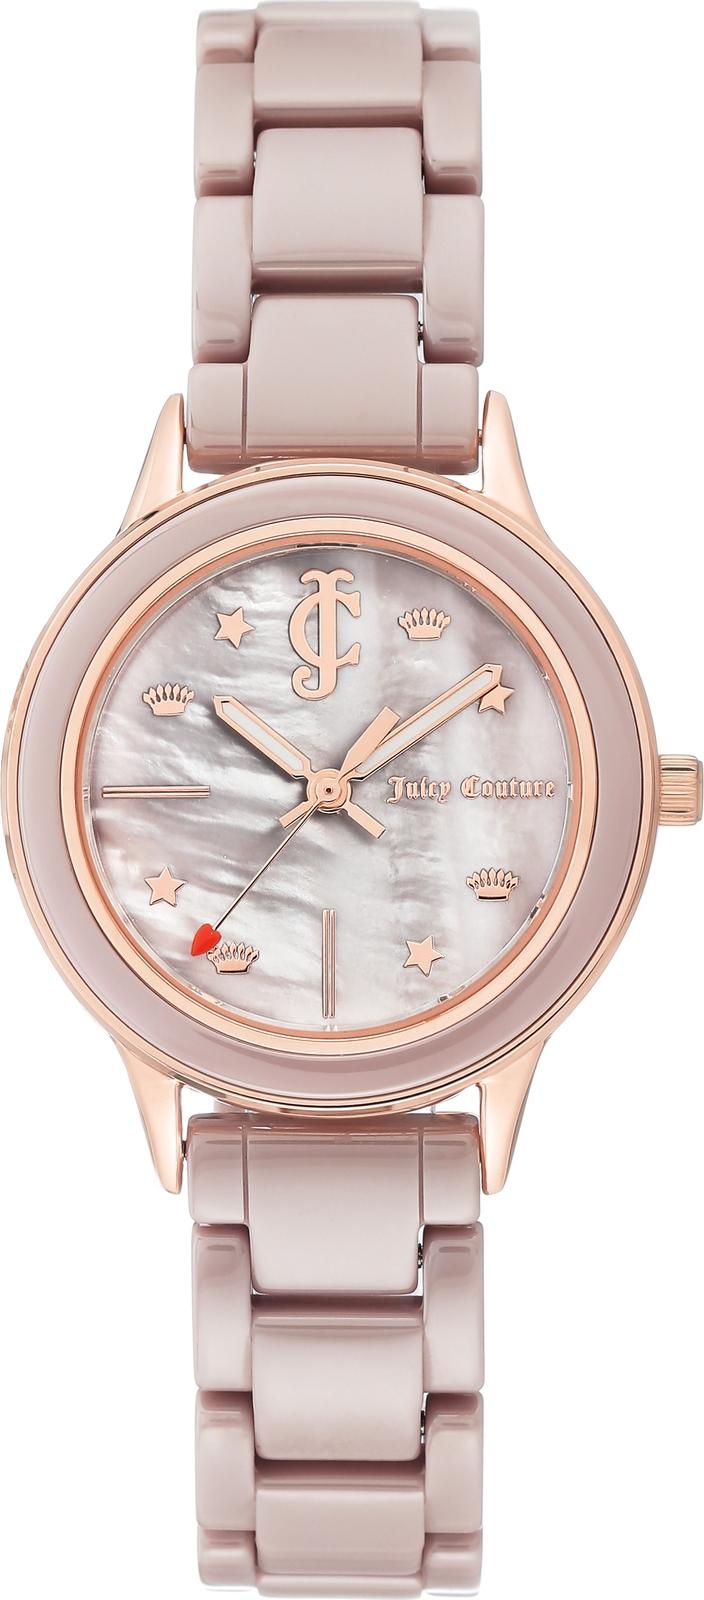 цена Часы Juicy Couture женские бежевый онлайн в 2017 году